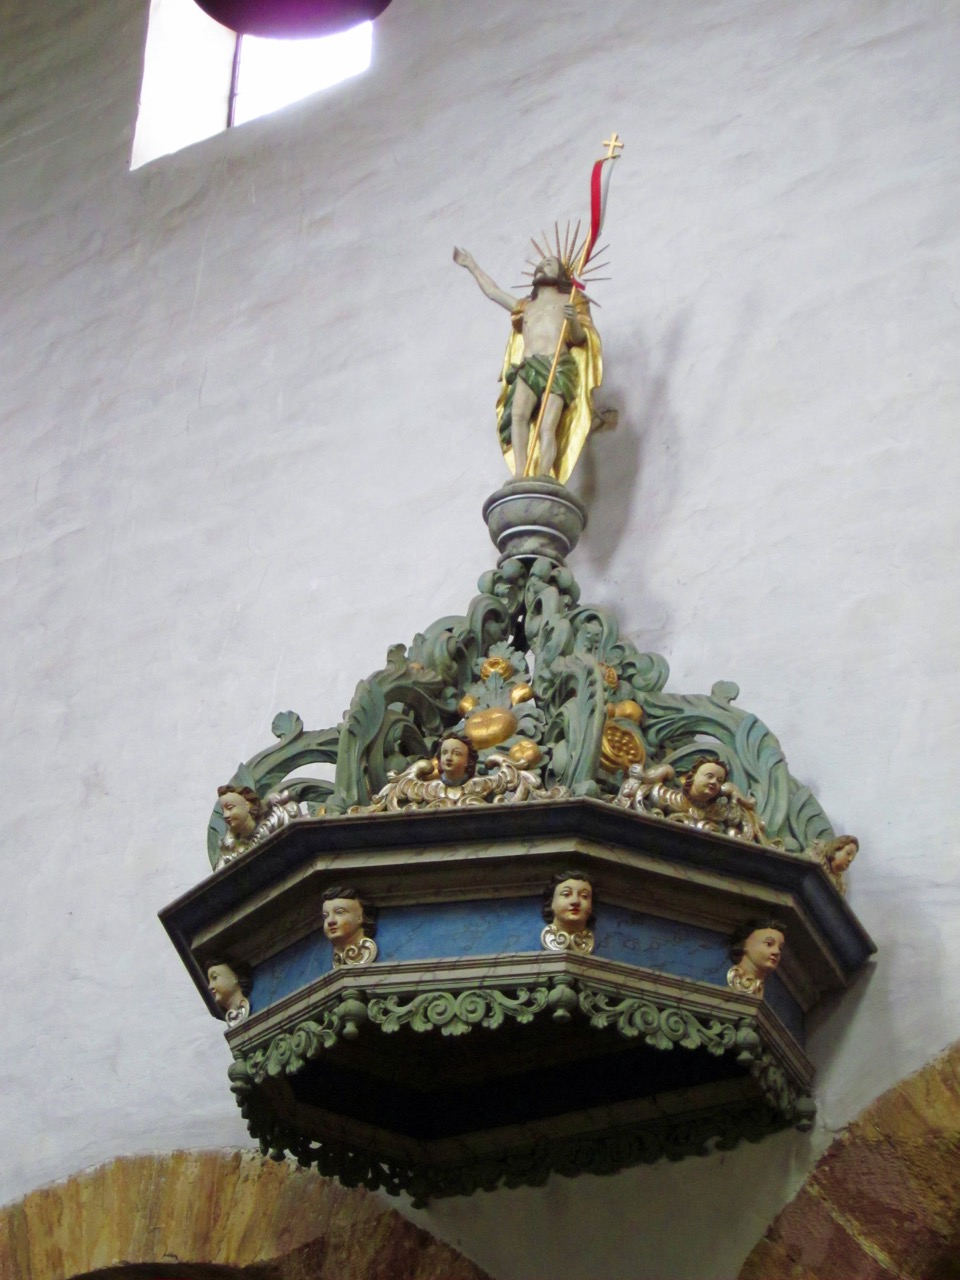 Schalldeckel Kanzel, 17. Jahrhundert